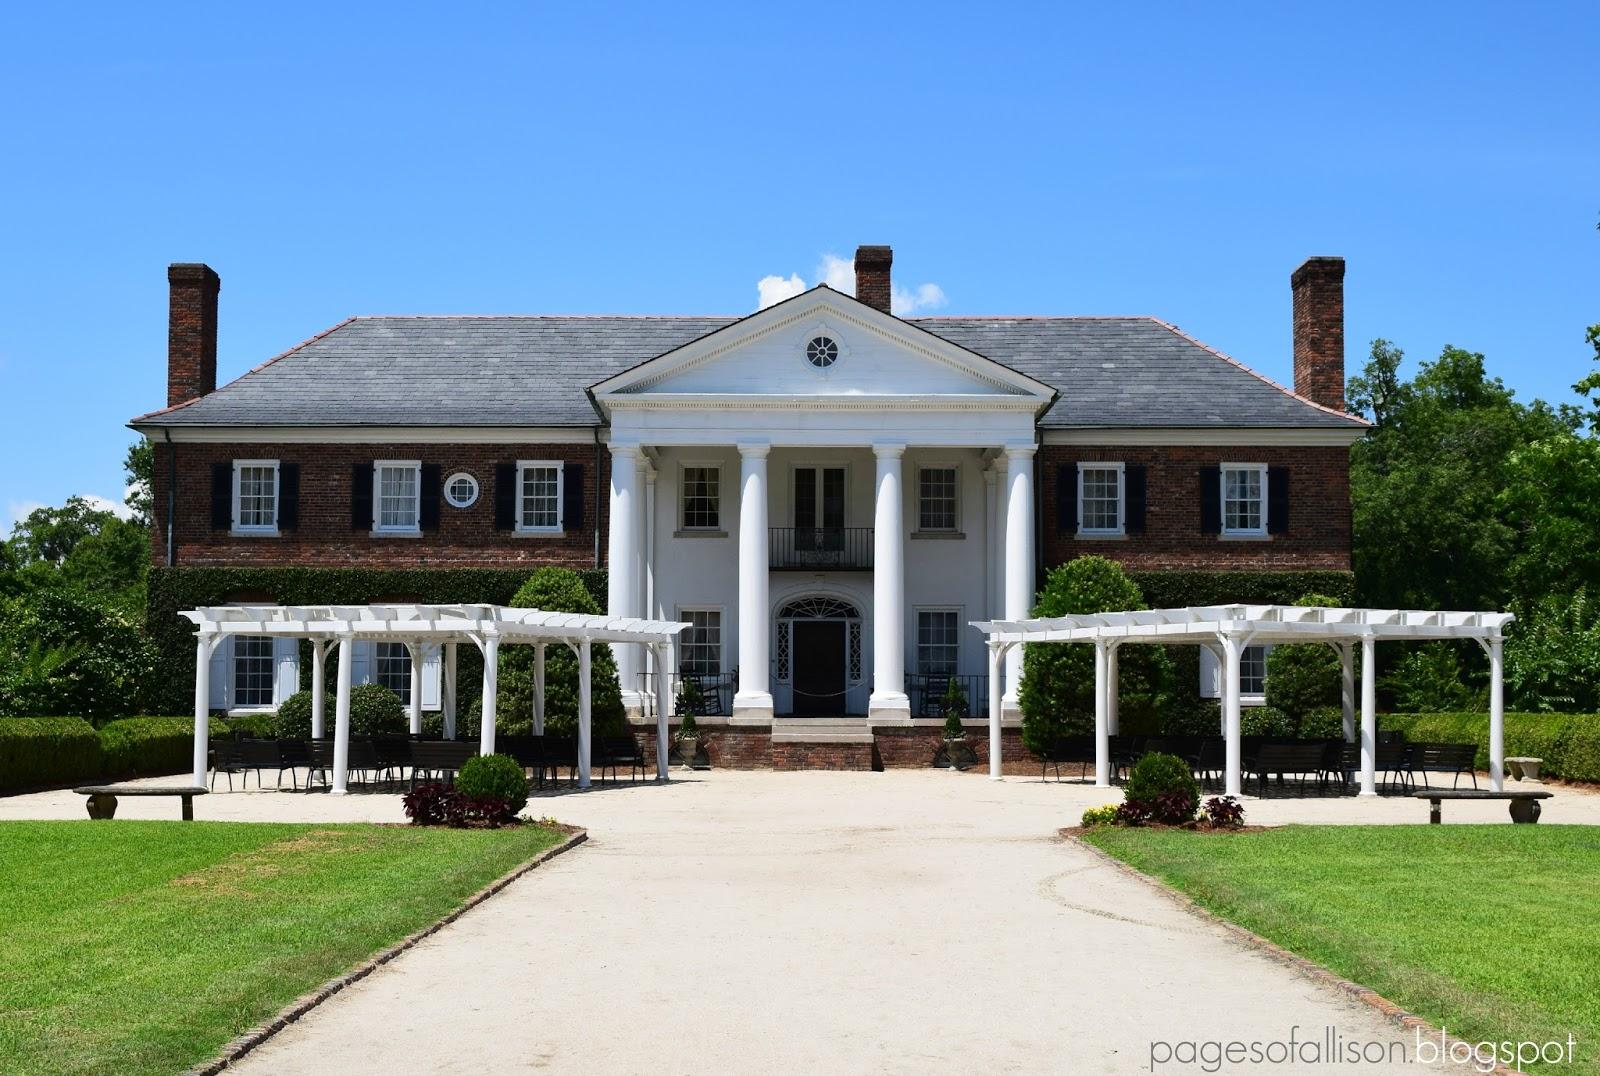 Pages of Allison: Boone Hall Plantation, South Carolina